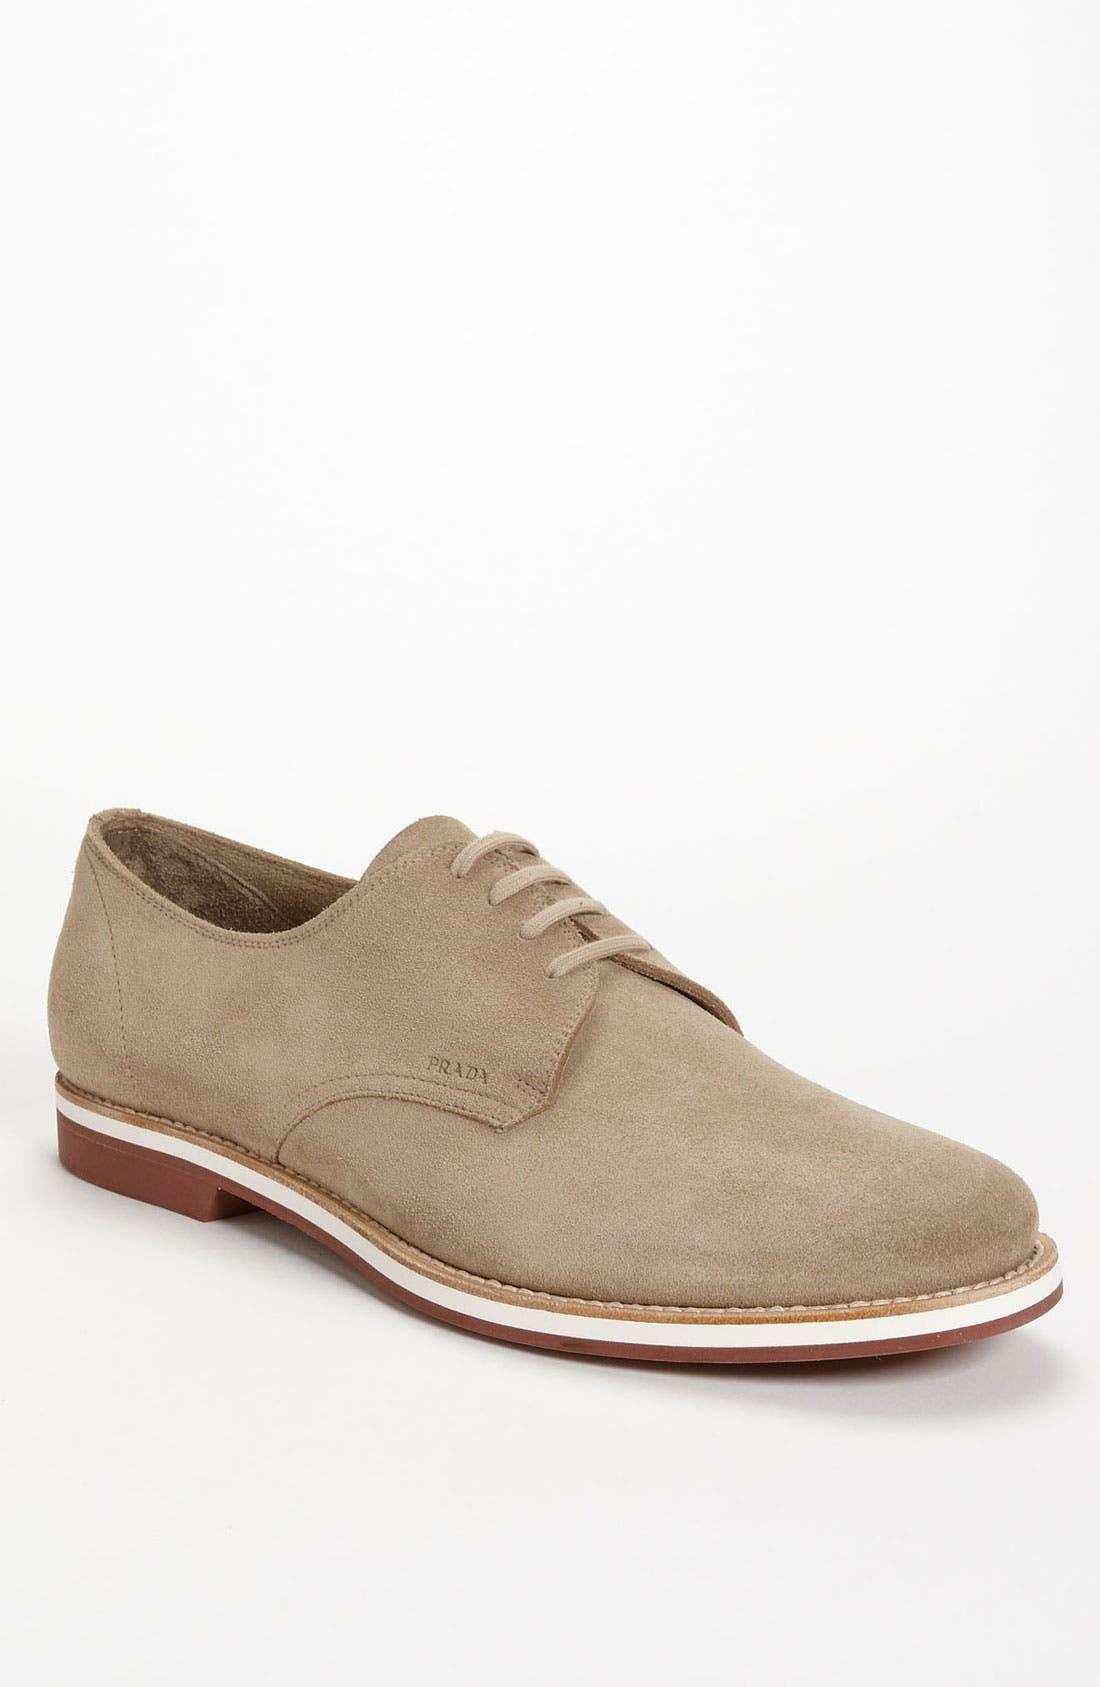 Alternate Image 1 Selected - Prada Suede Buck Shoe